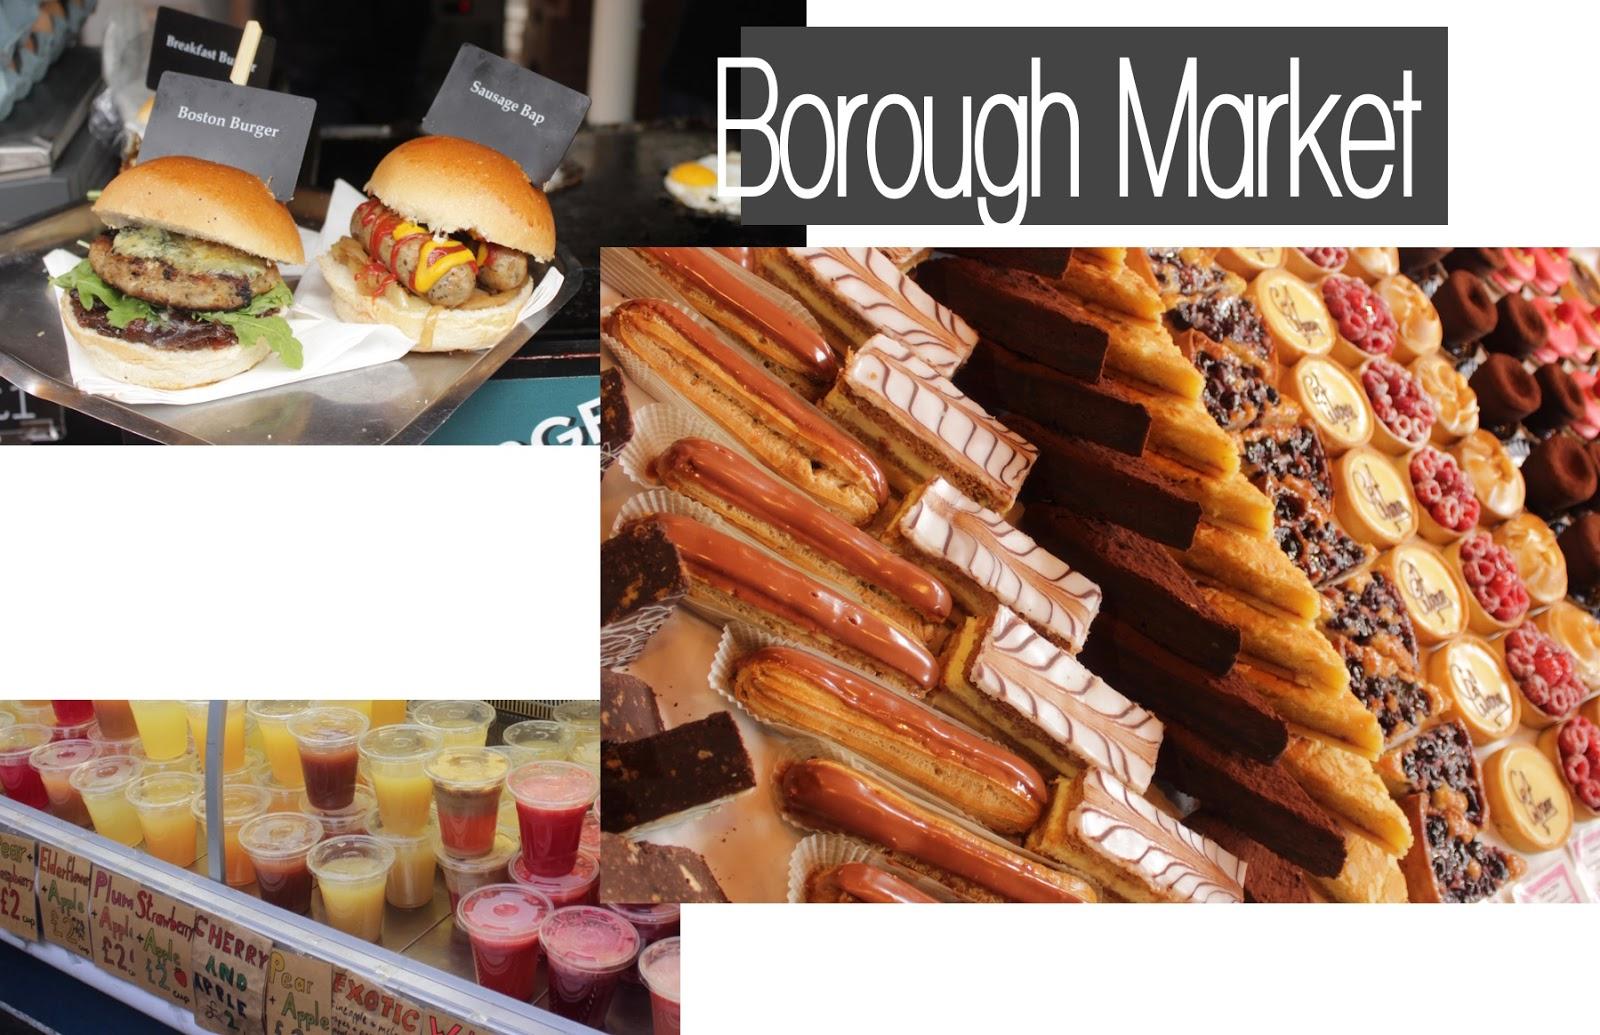 Food Restaurants London Travel Guide Borough Market